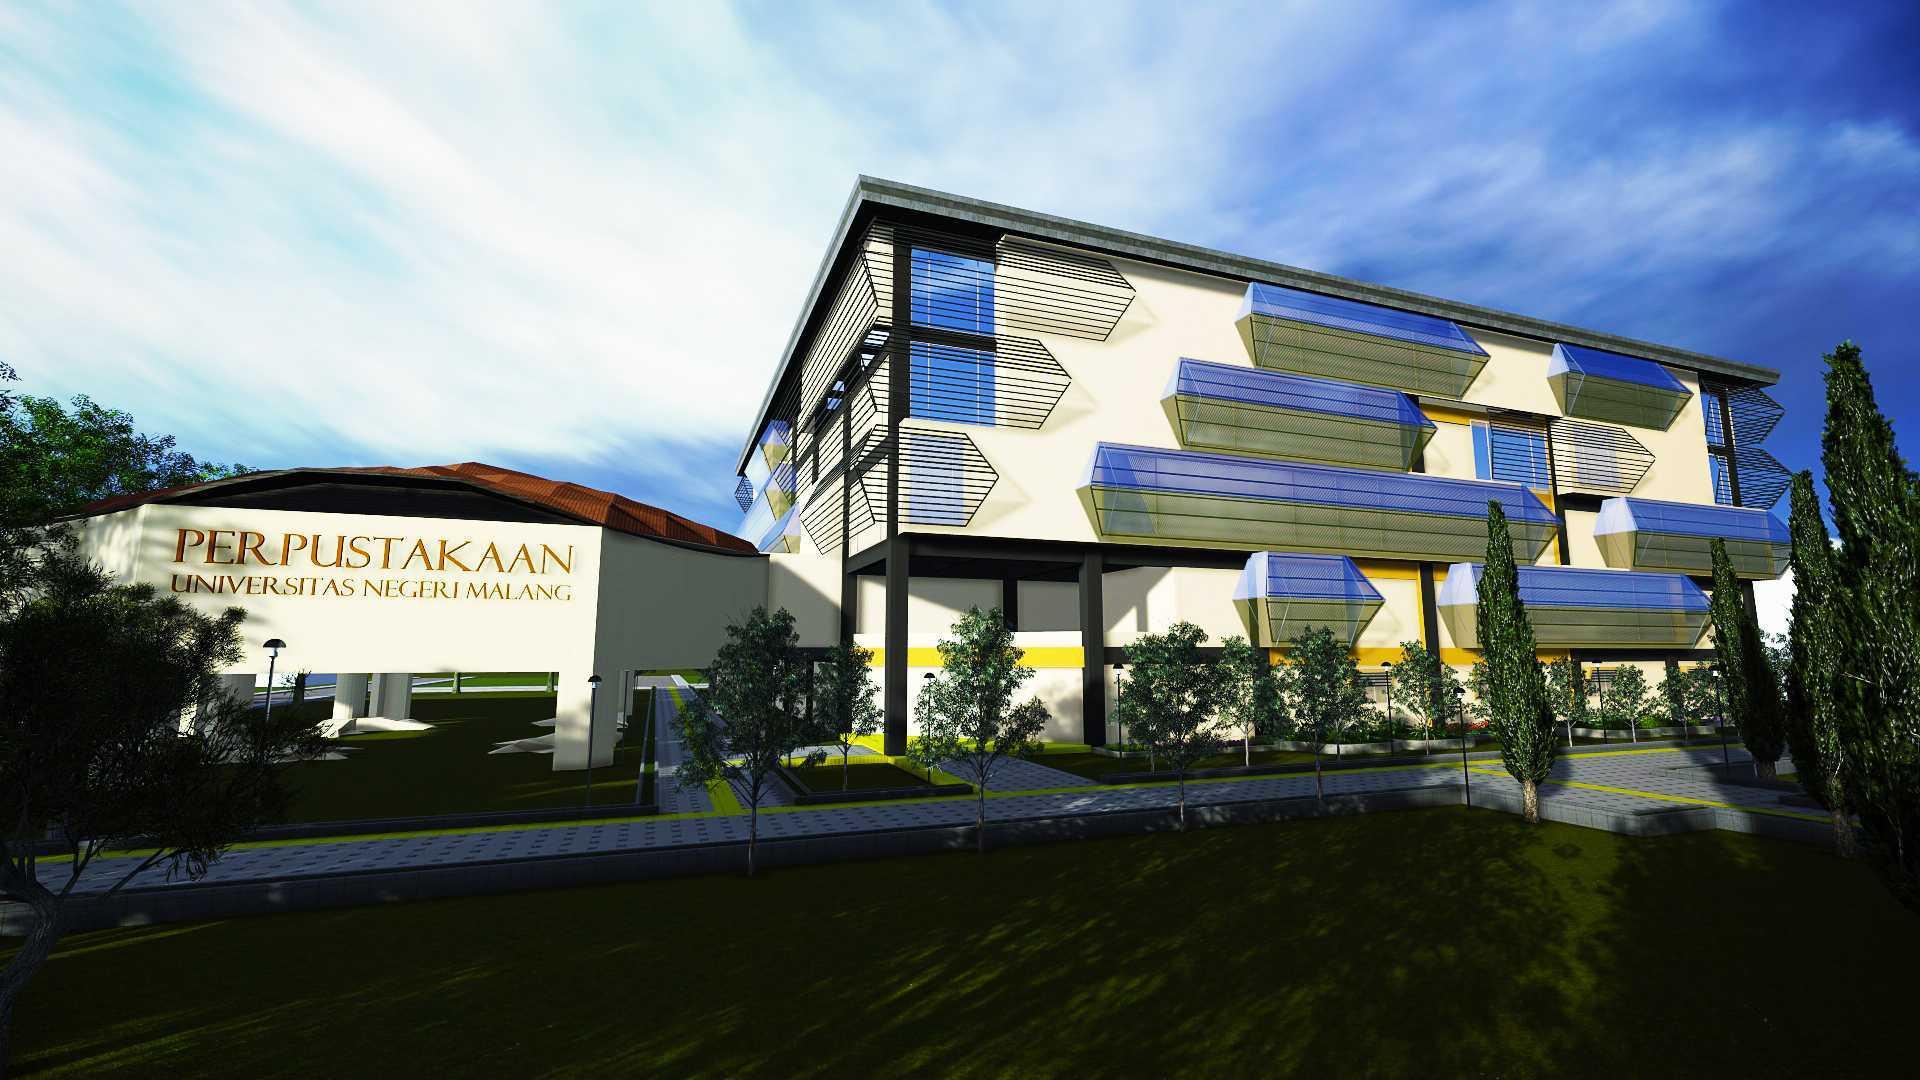 Parades Studio Library Building Malang-Indonesia Malang-Indonesia Front View Kontemporer  12357